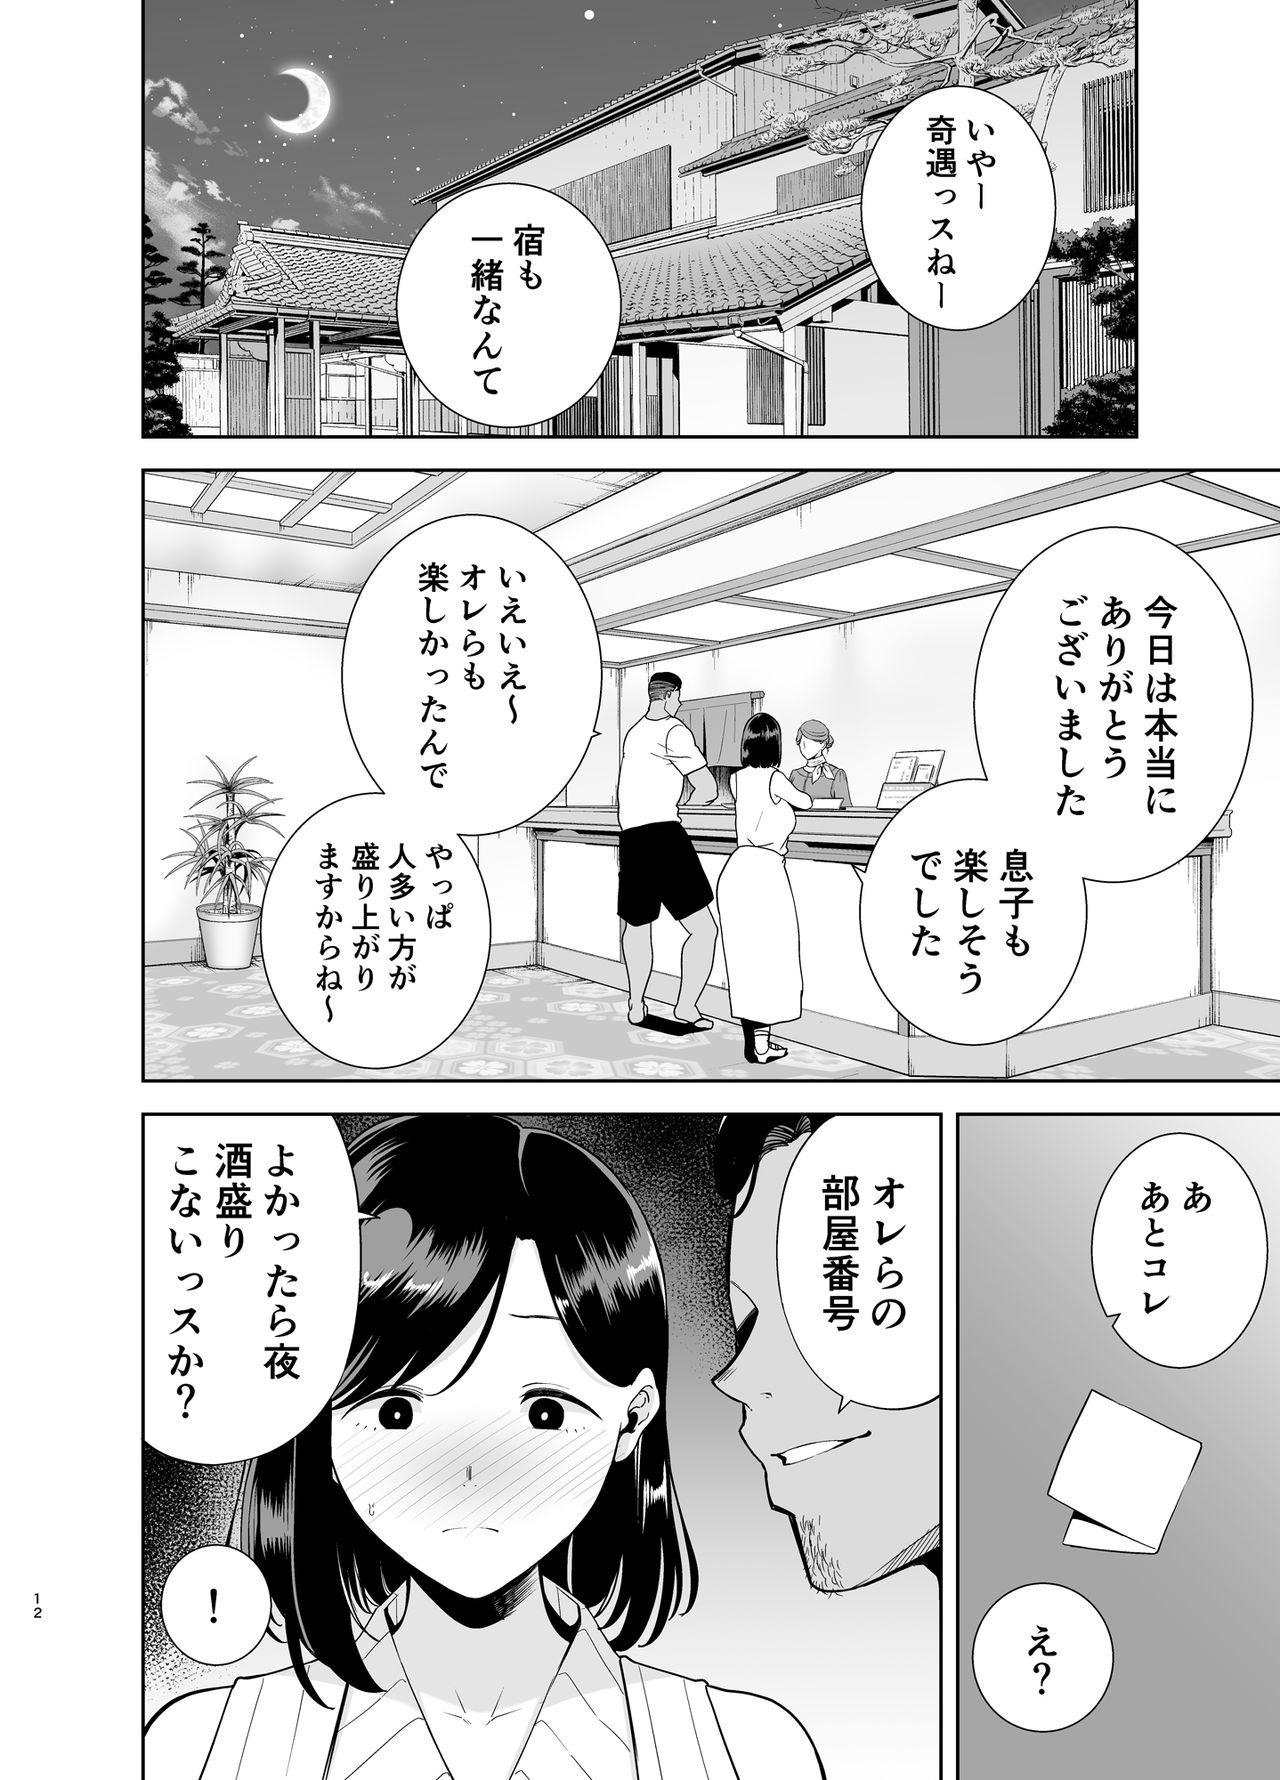 Natsuzuma 110